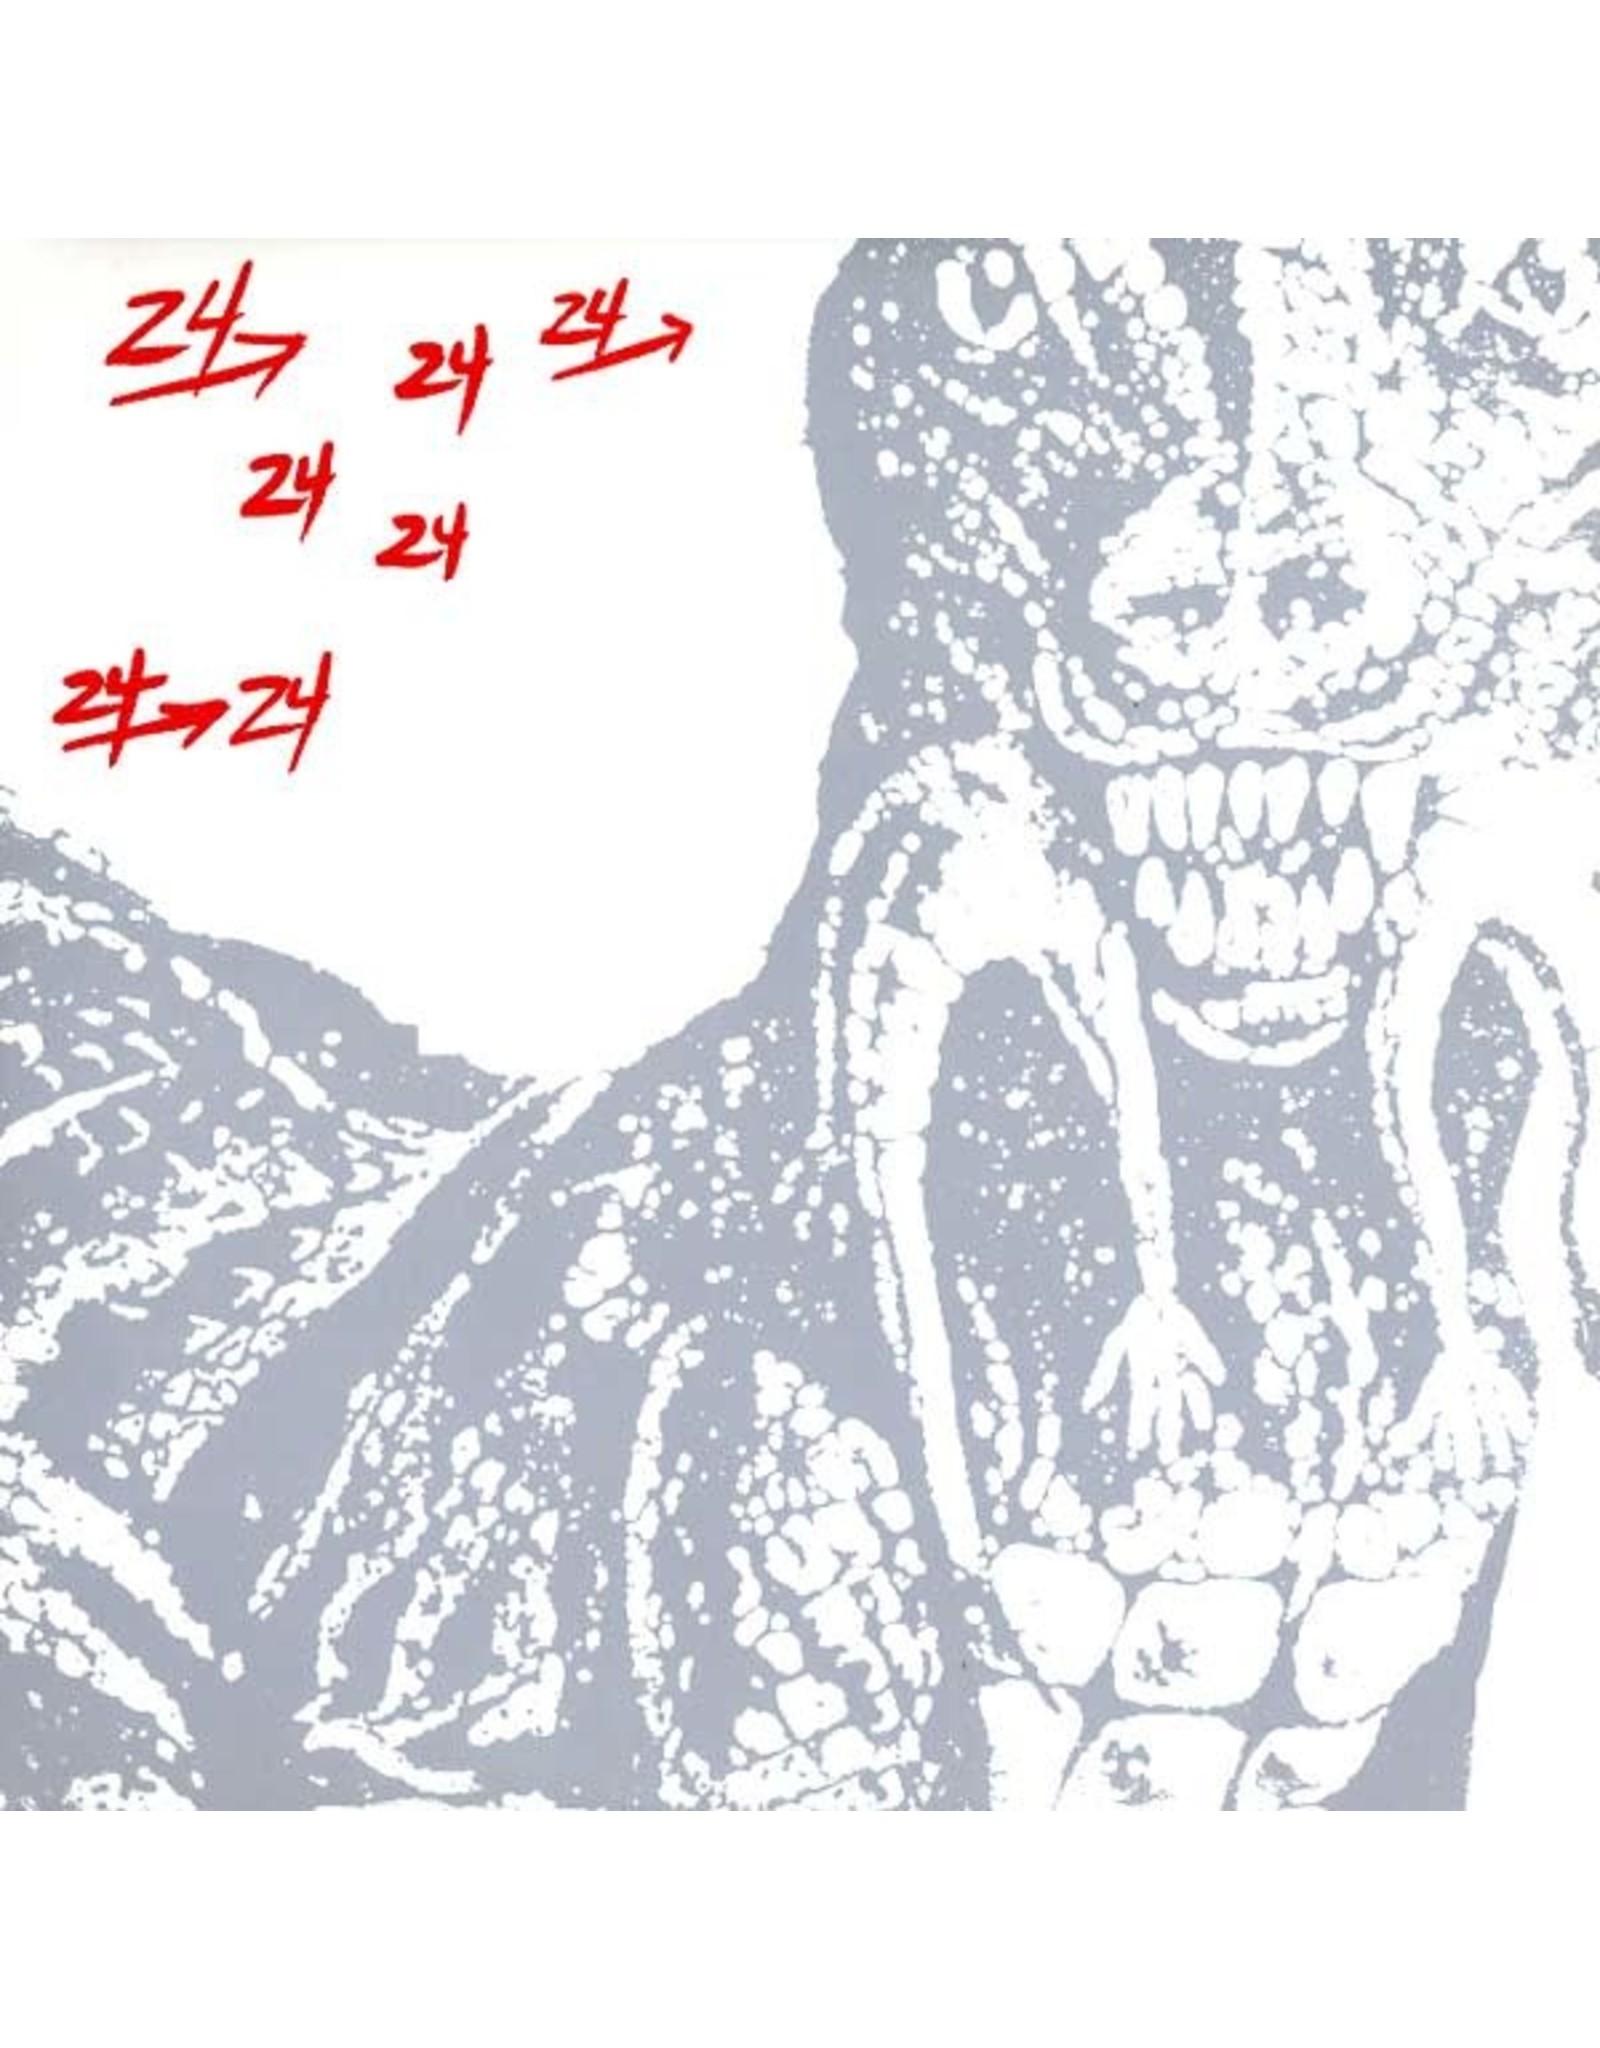 Traffic Dinosaur L: 24 >24 Music LP